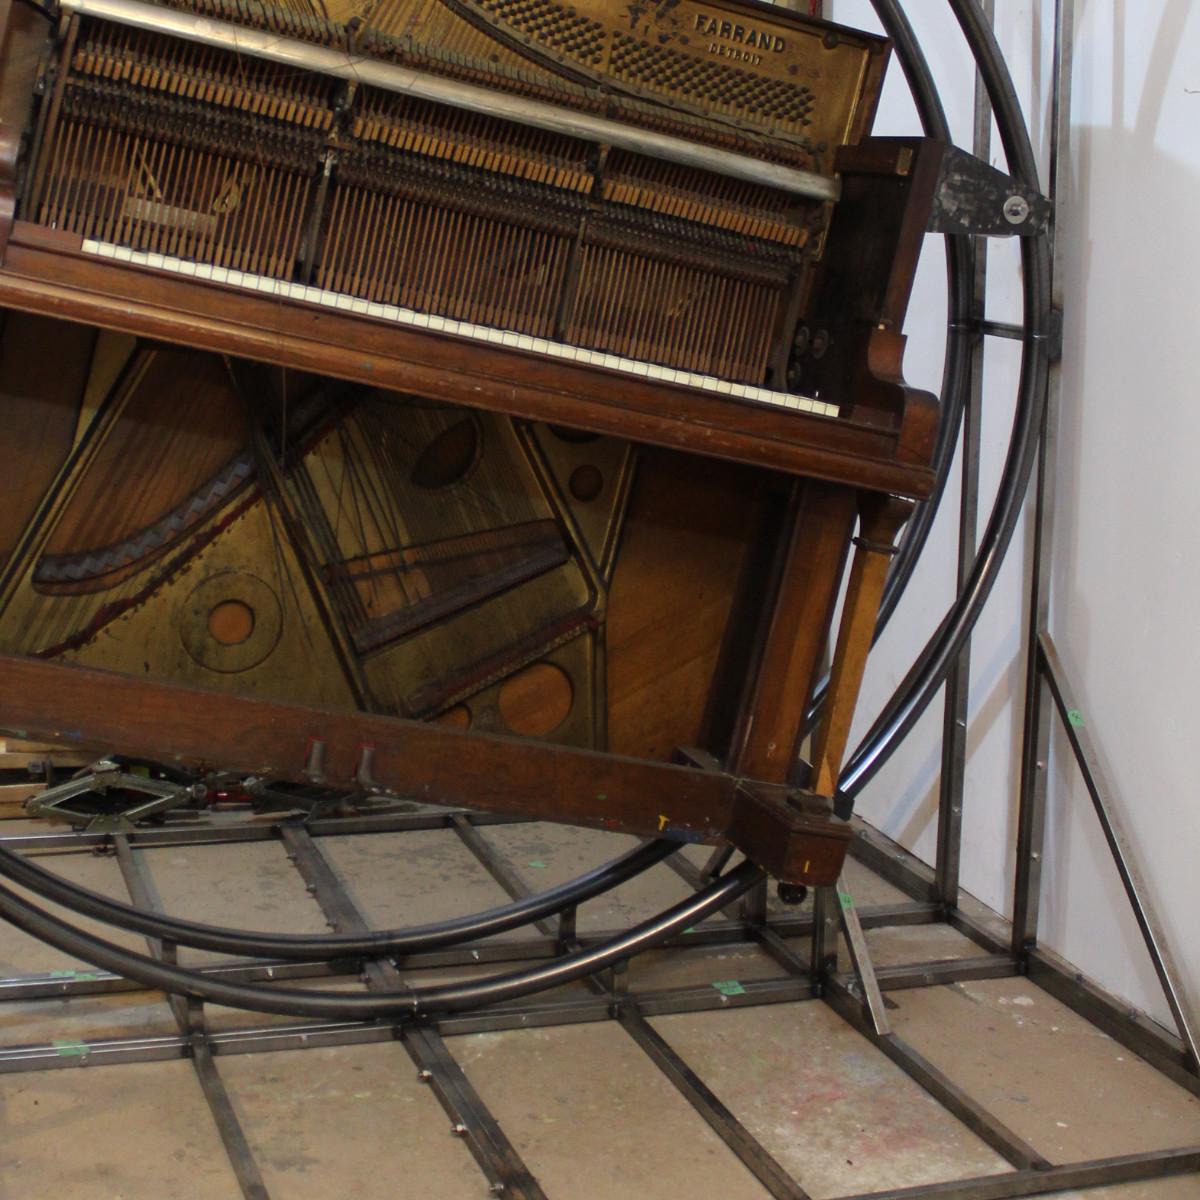 PianoFramework Cropped